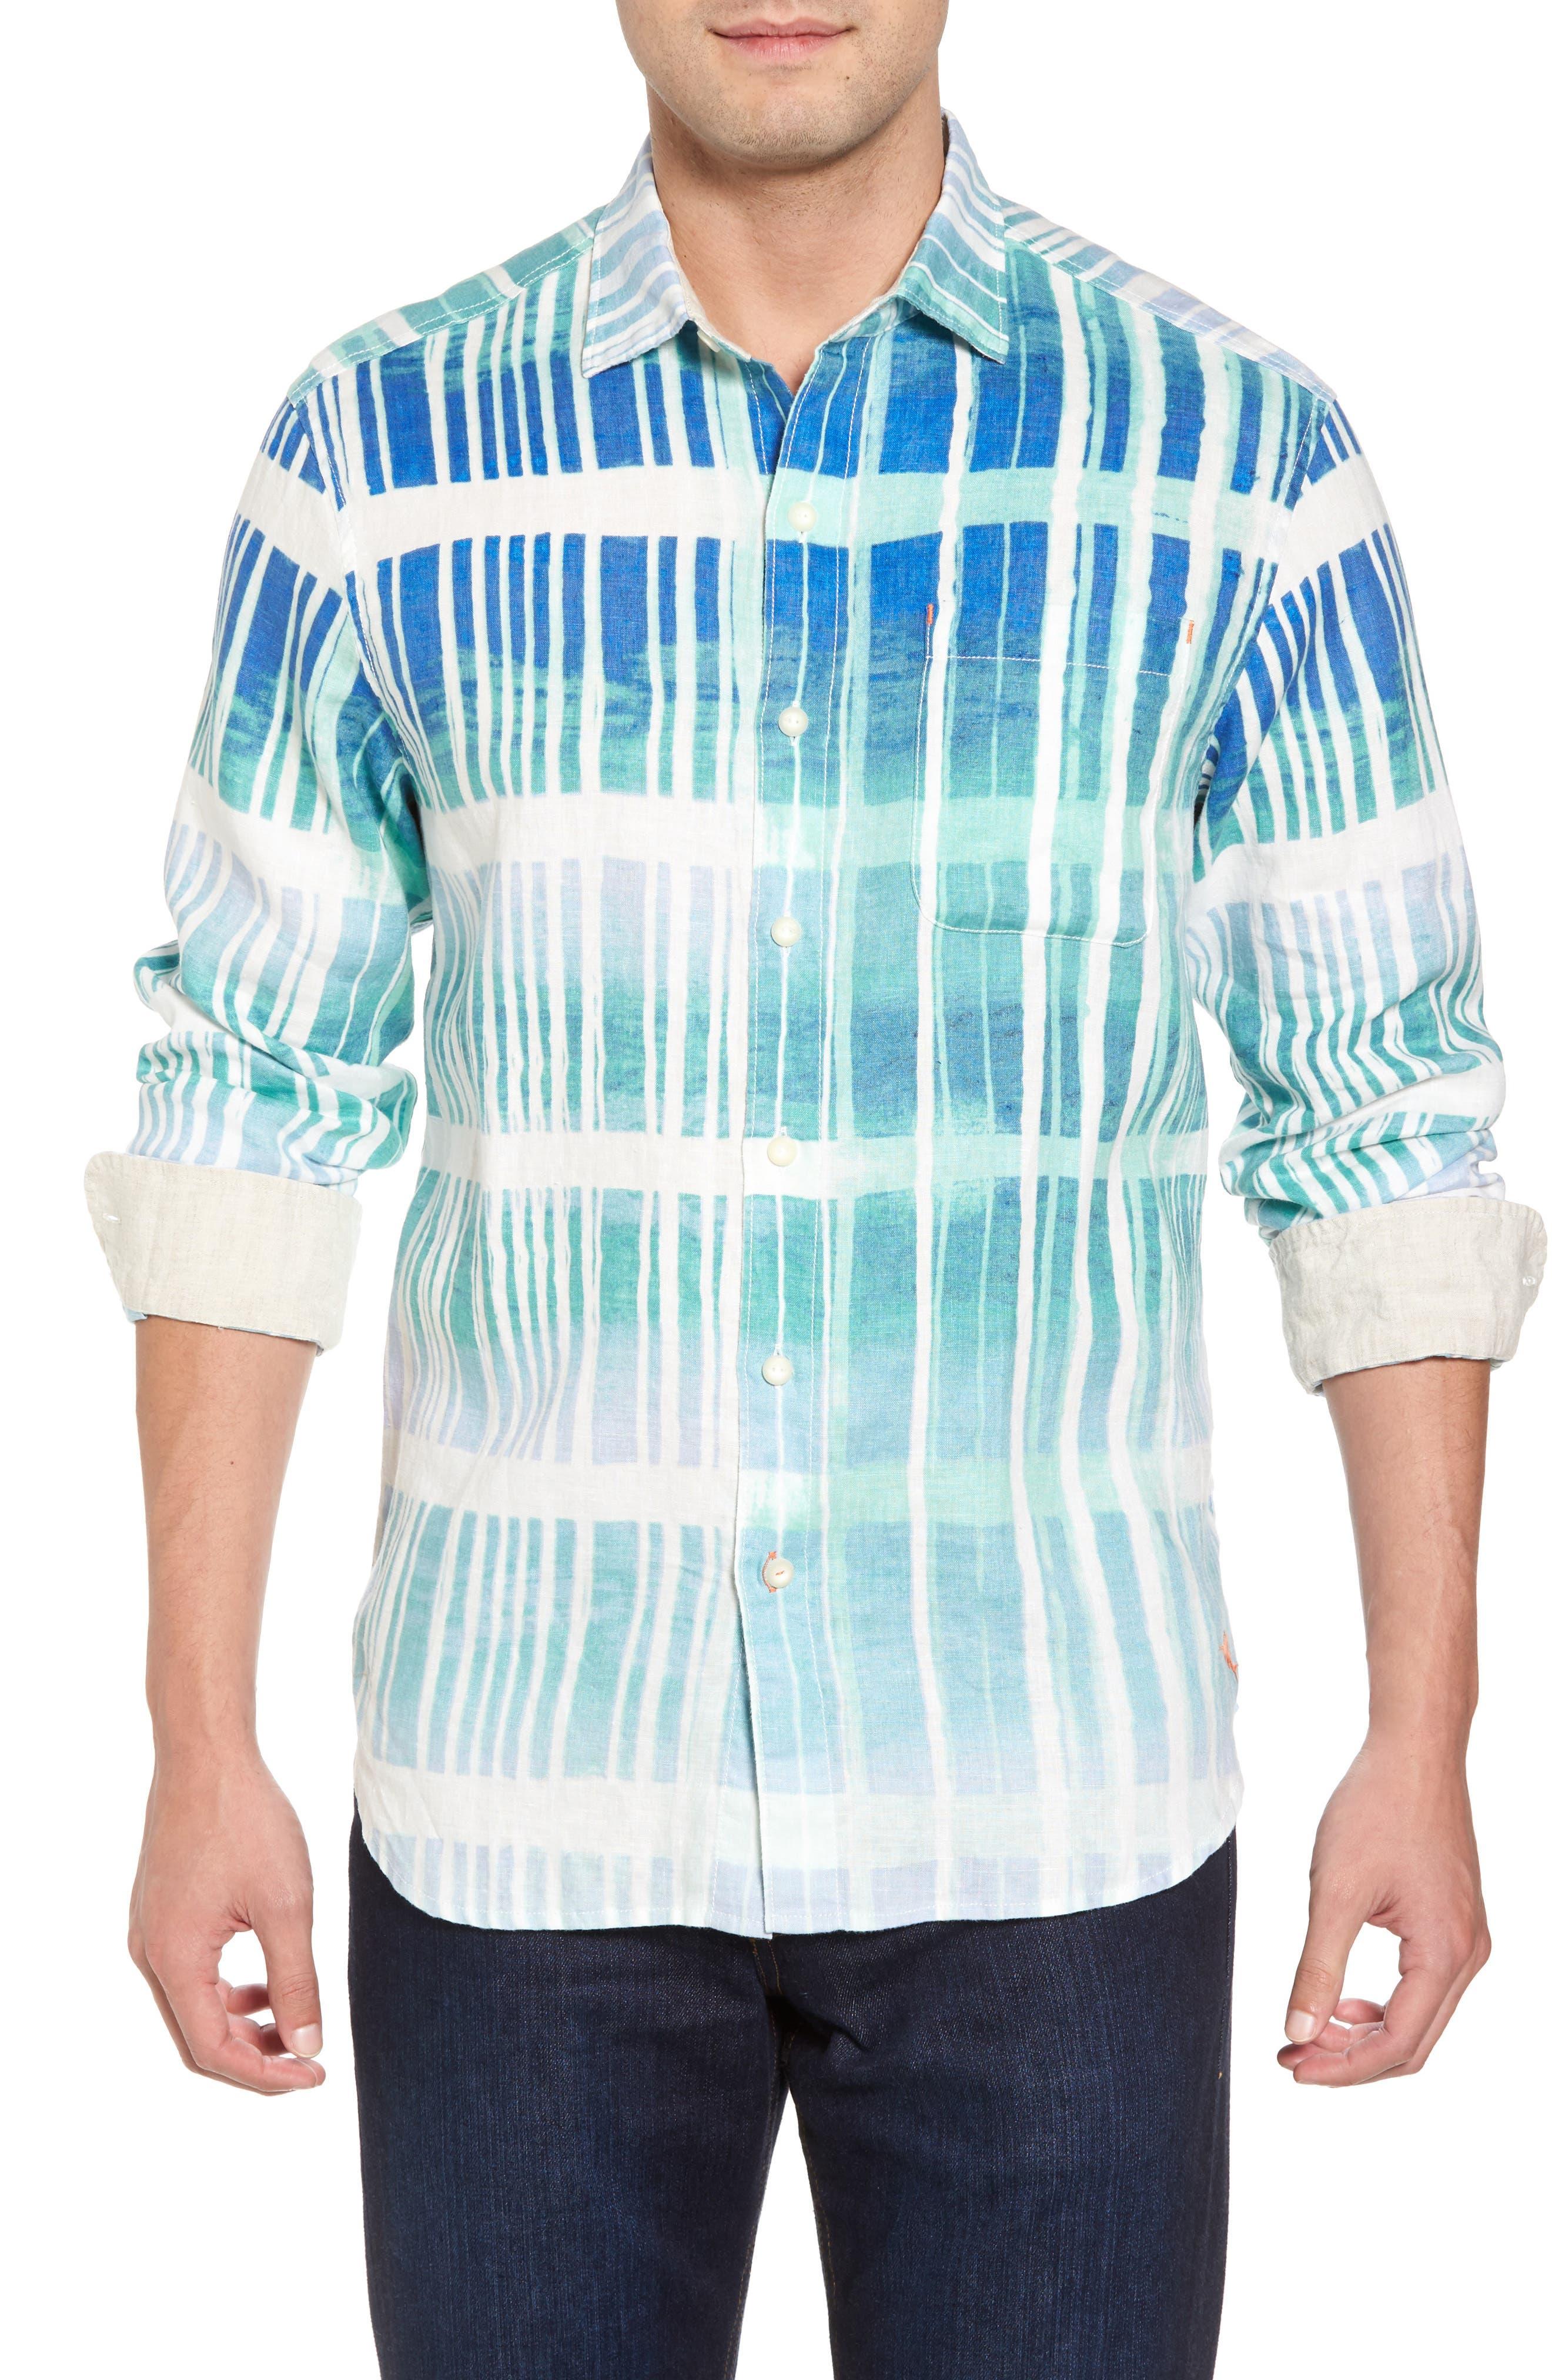 Okeechobee Ombré Breezer Sport Shirt,                             Main thumbnail 1, color,                             Santorini Blue